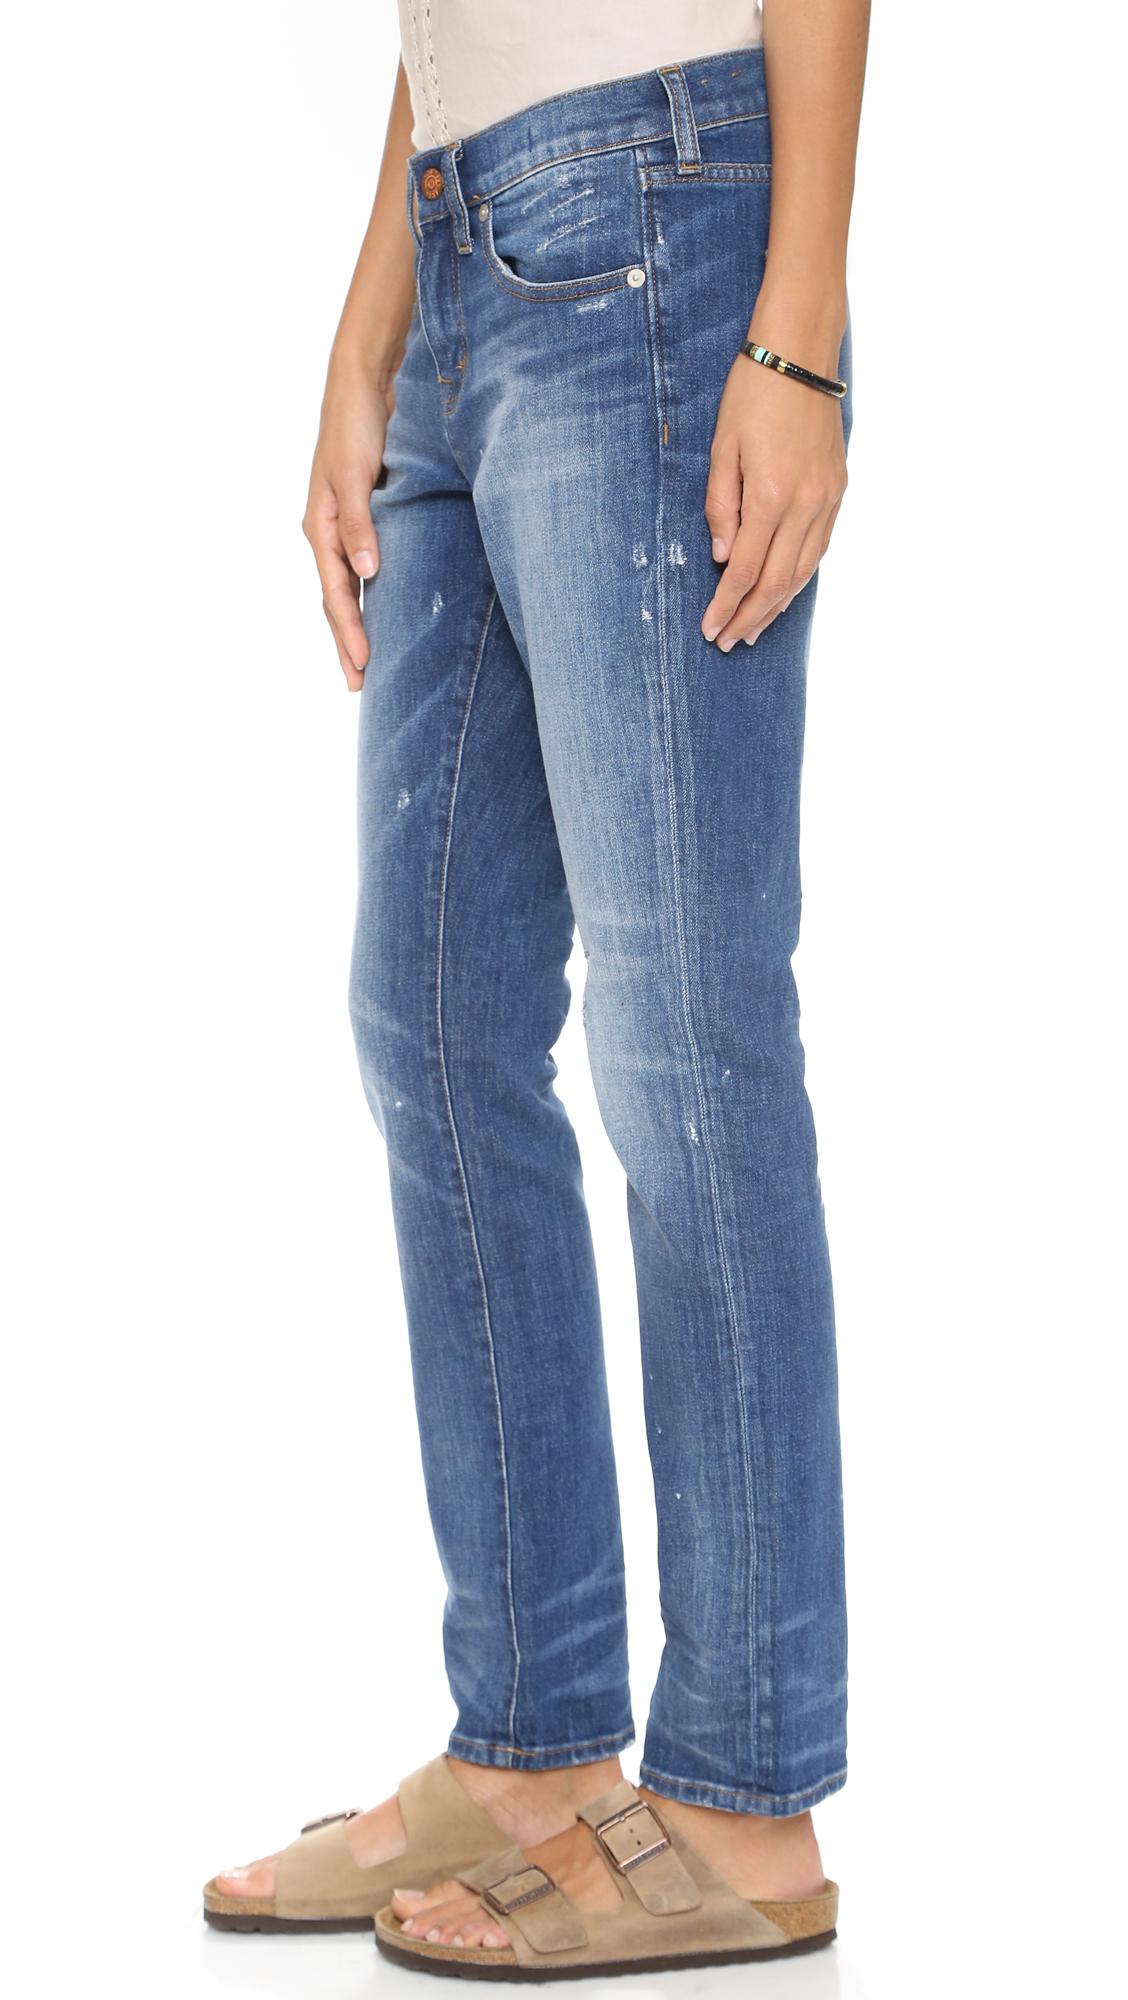 Madewell Slim Hatfield Boyfriend Jeans - Hatfield Wash in Blue